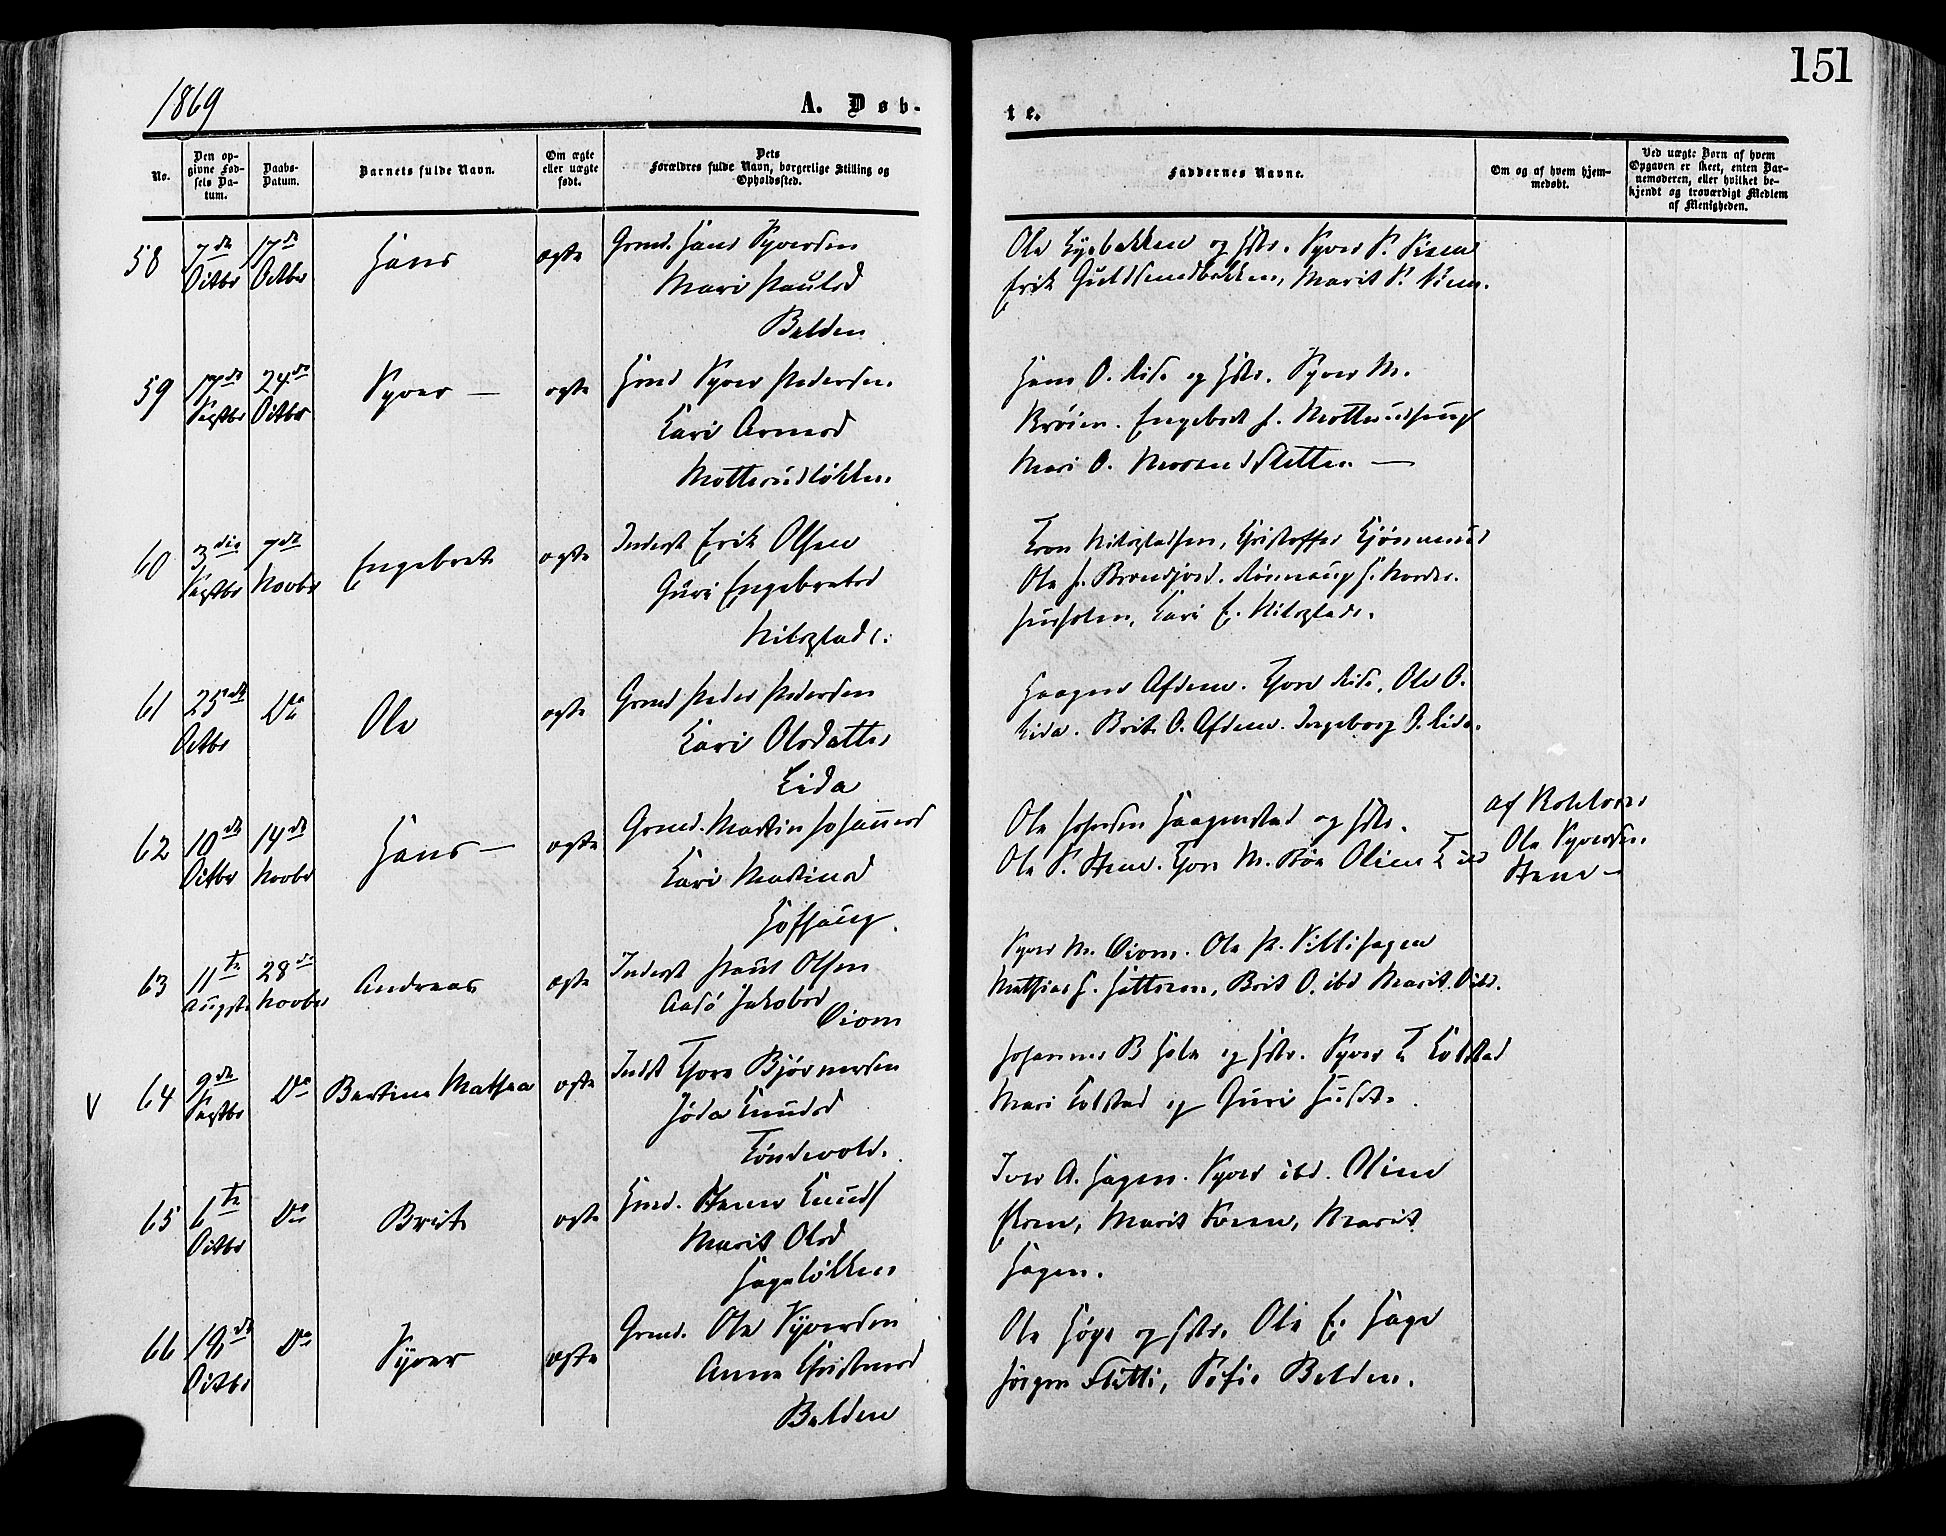 SAH, Lesja prestekontor, Ministerialbok nr. 8, 1854-1880, s. 151